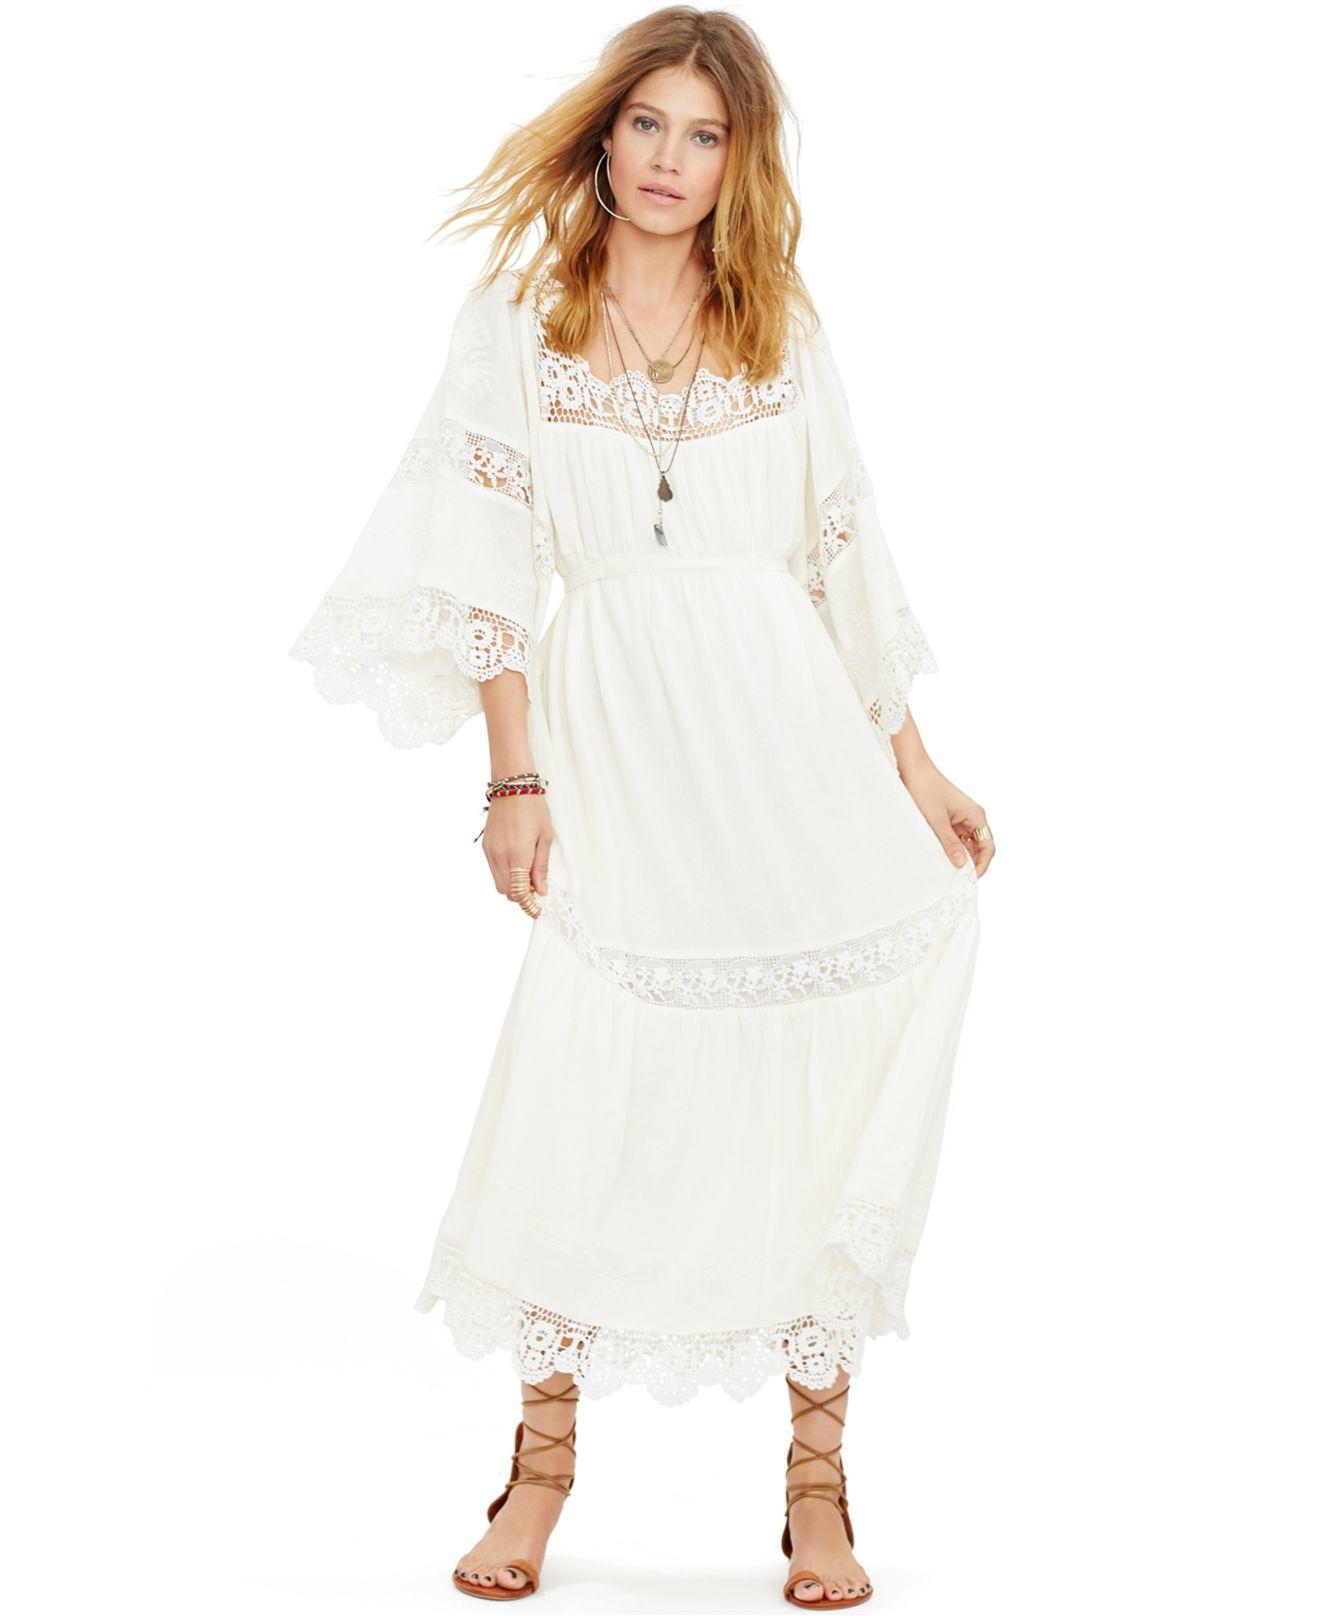 Images of White Bohemian Maxi Dress - Reikian